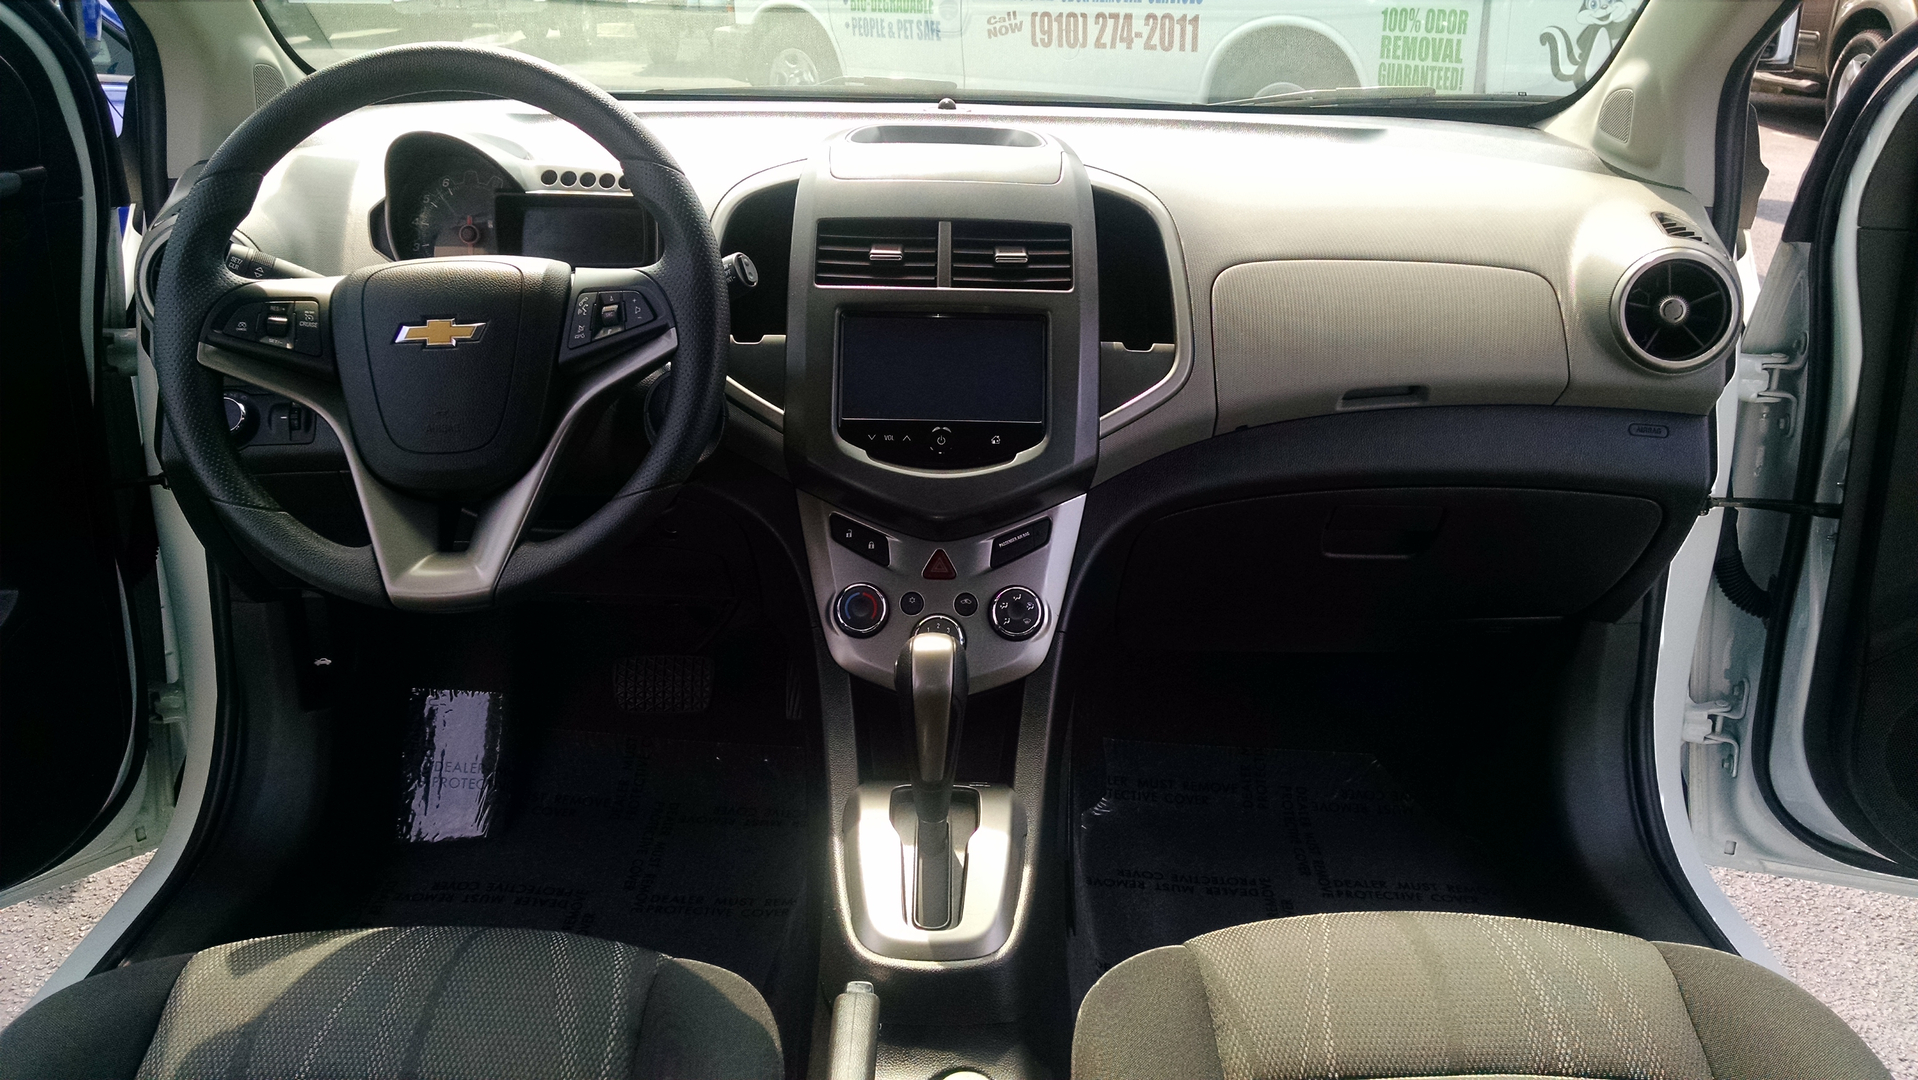 Car interior odor eliminator - Car Interior Odor Eliminator 77